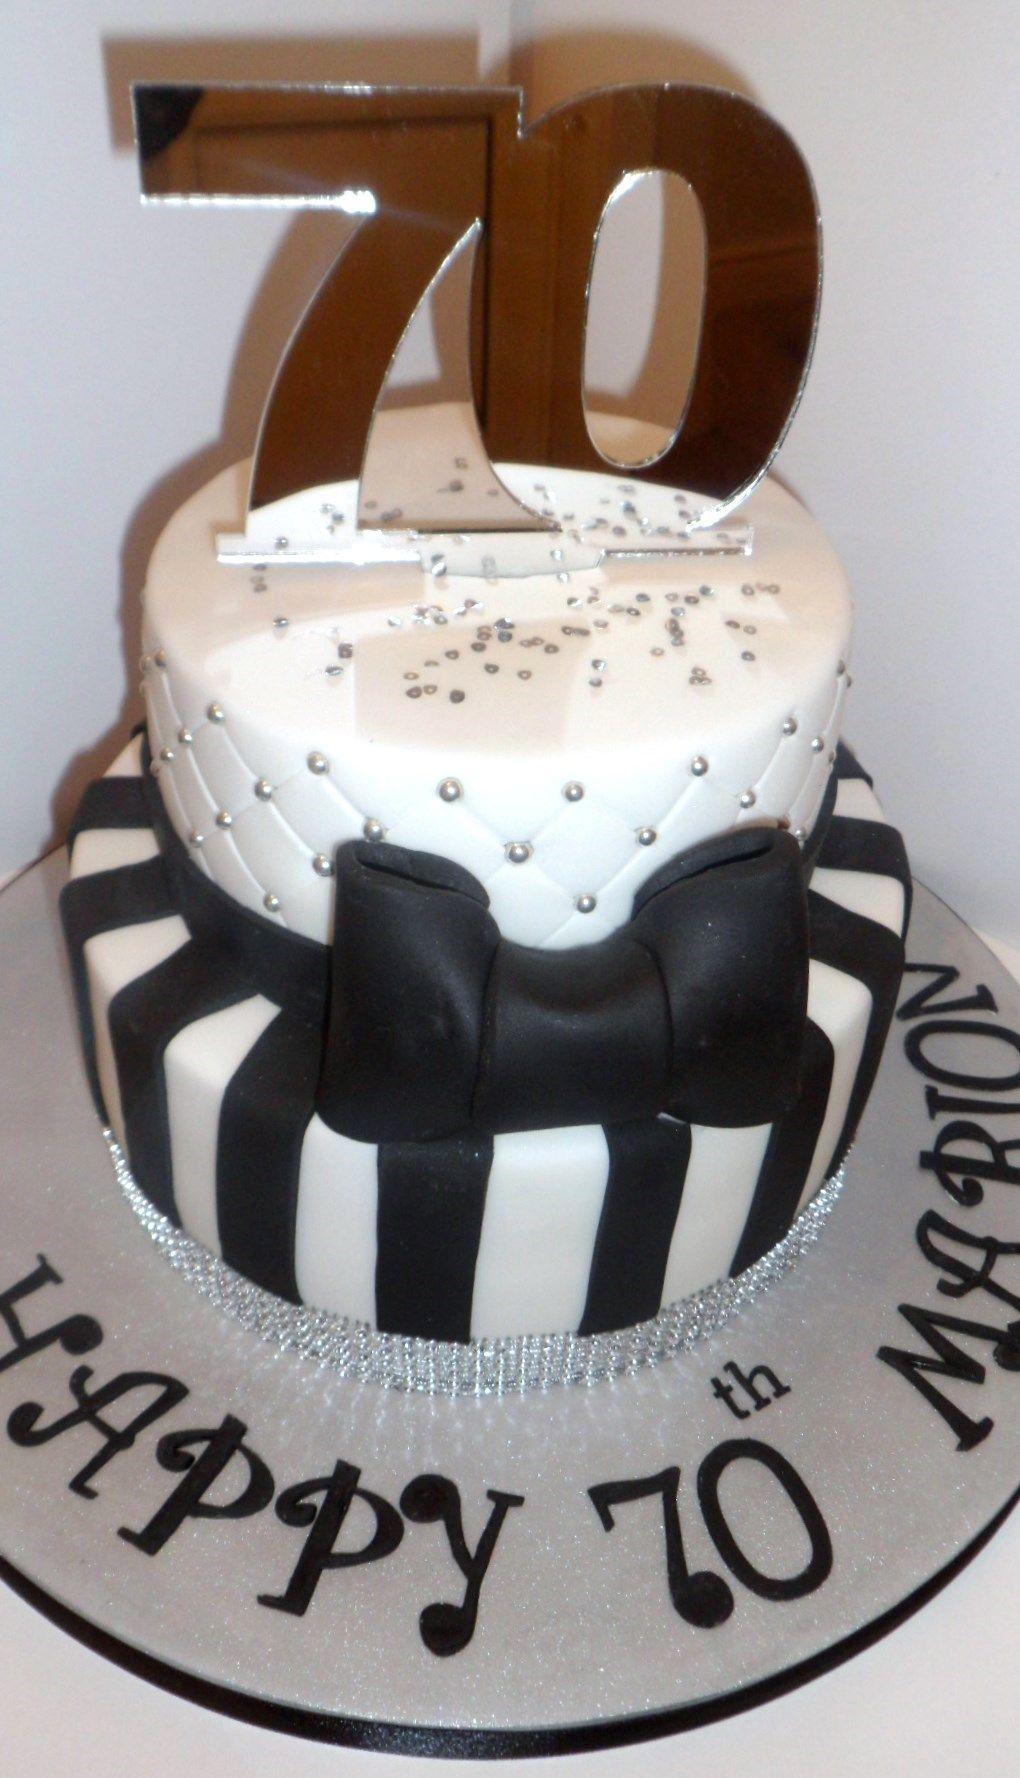 70th Birthday Cake 70th Birthday Cake Cake Cake Creations